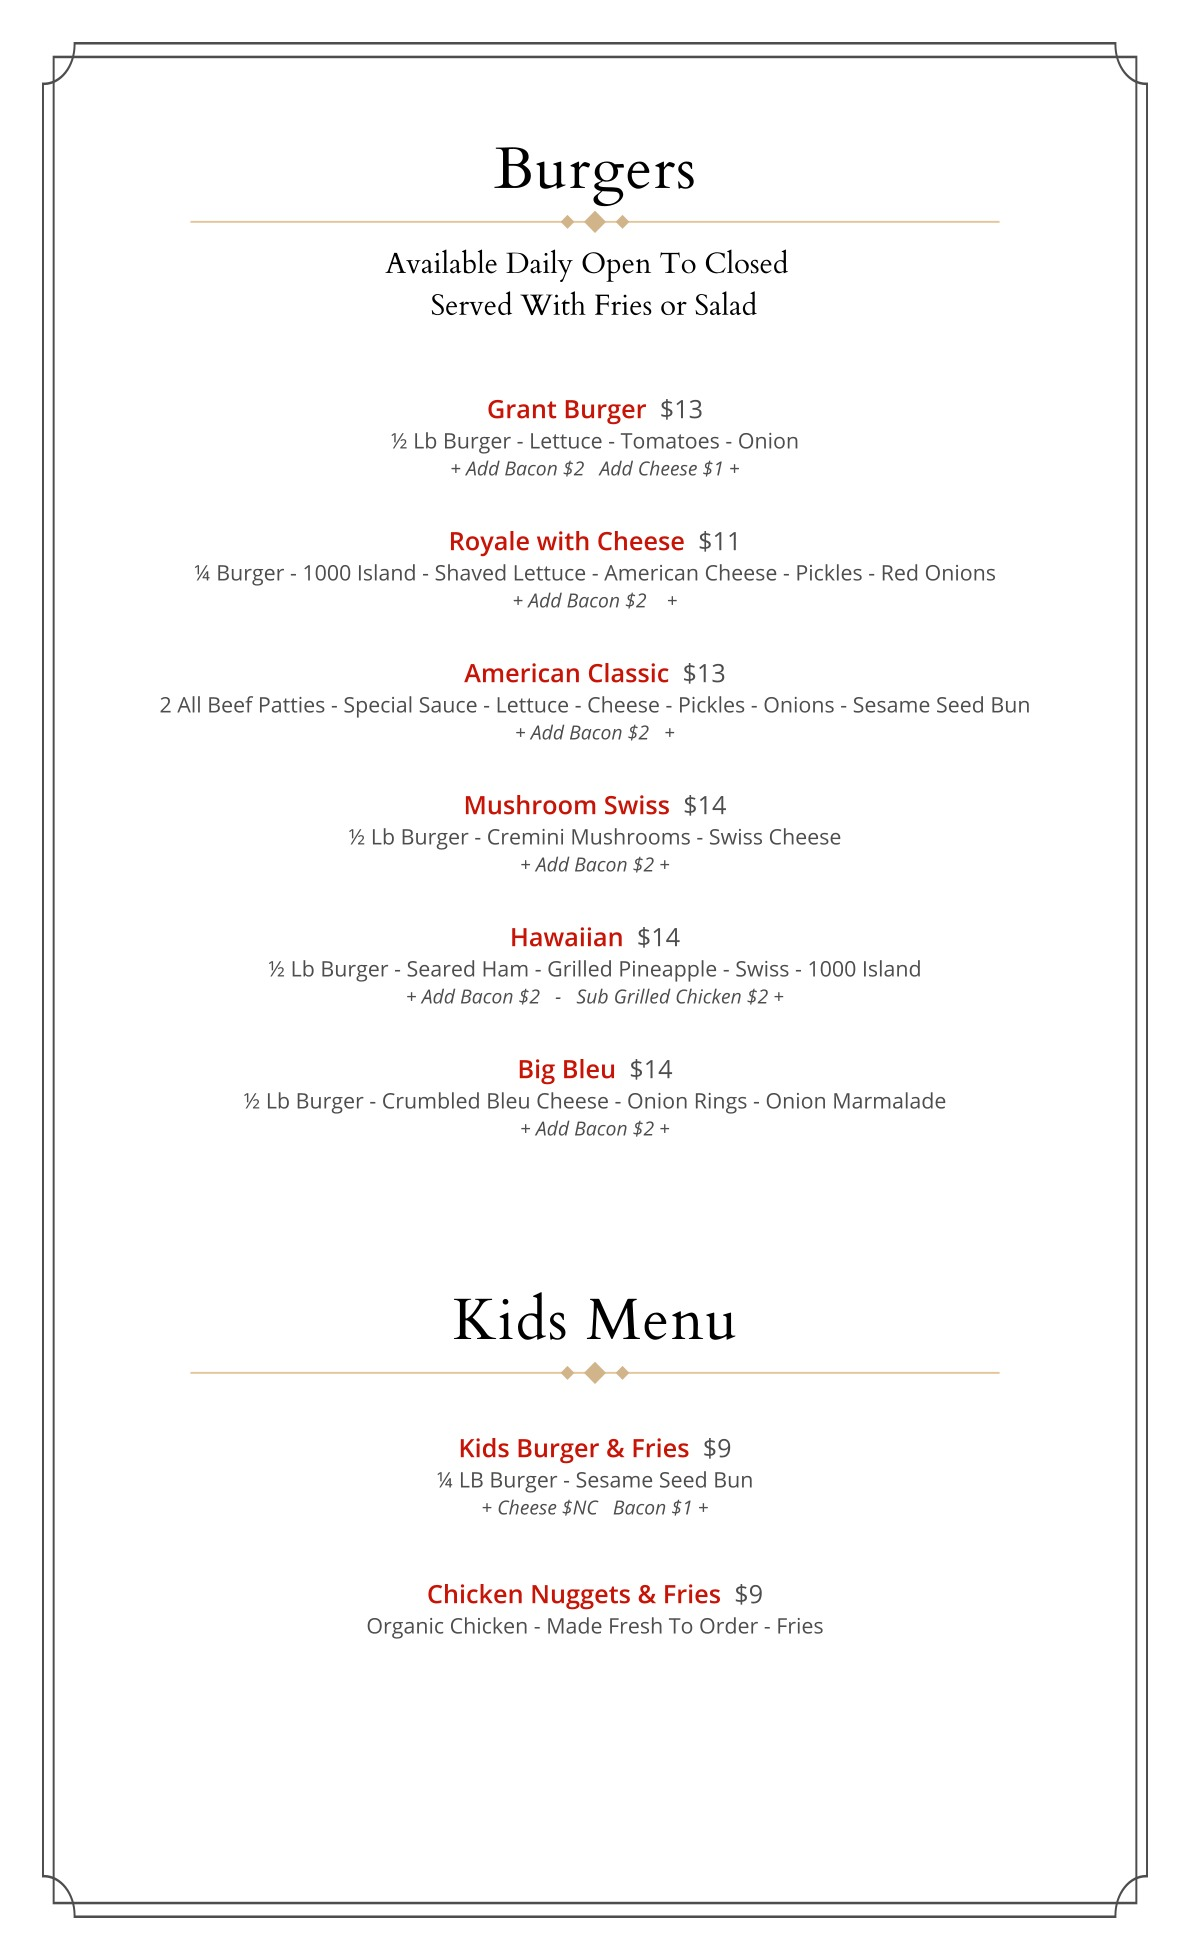 Burgers & Kids